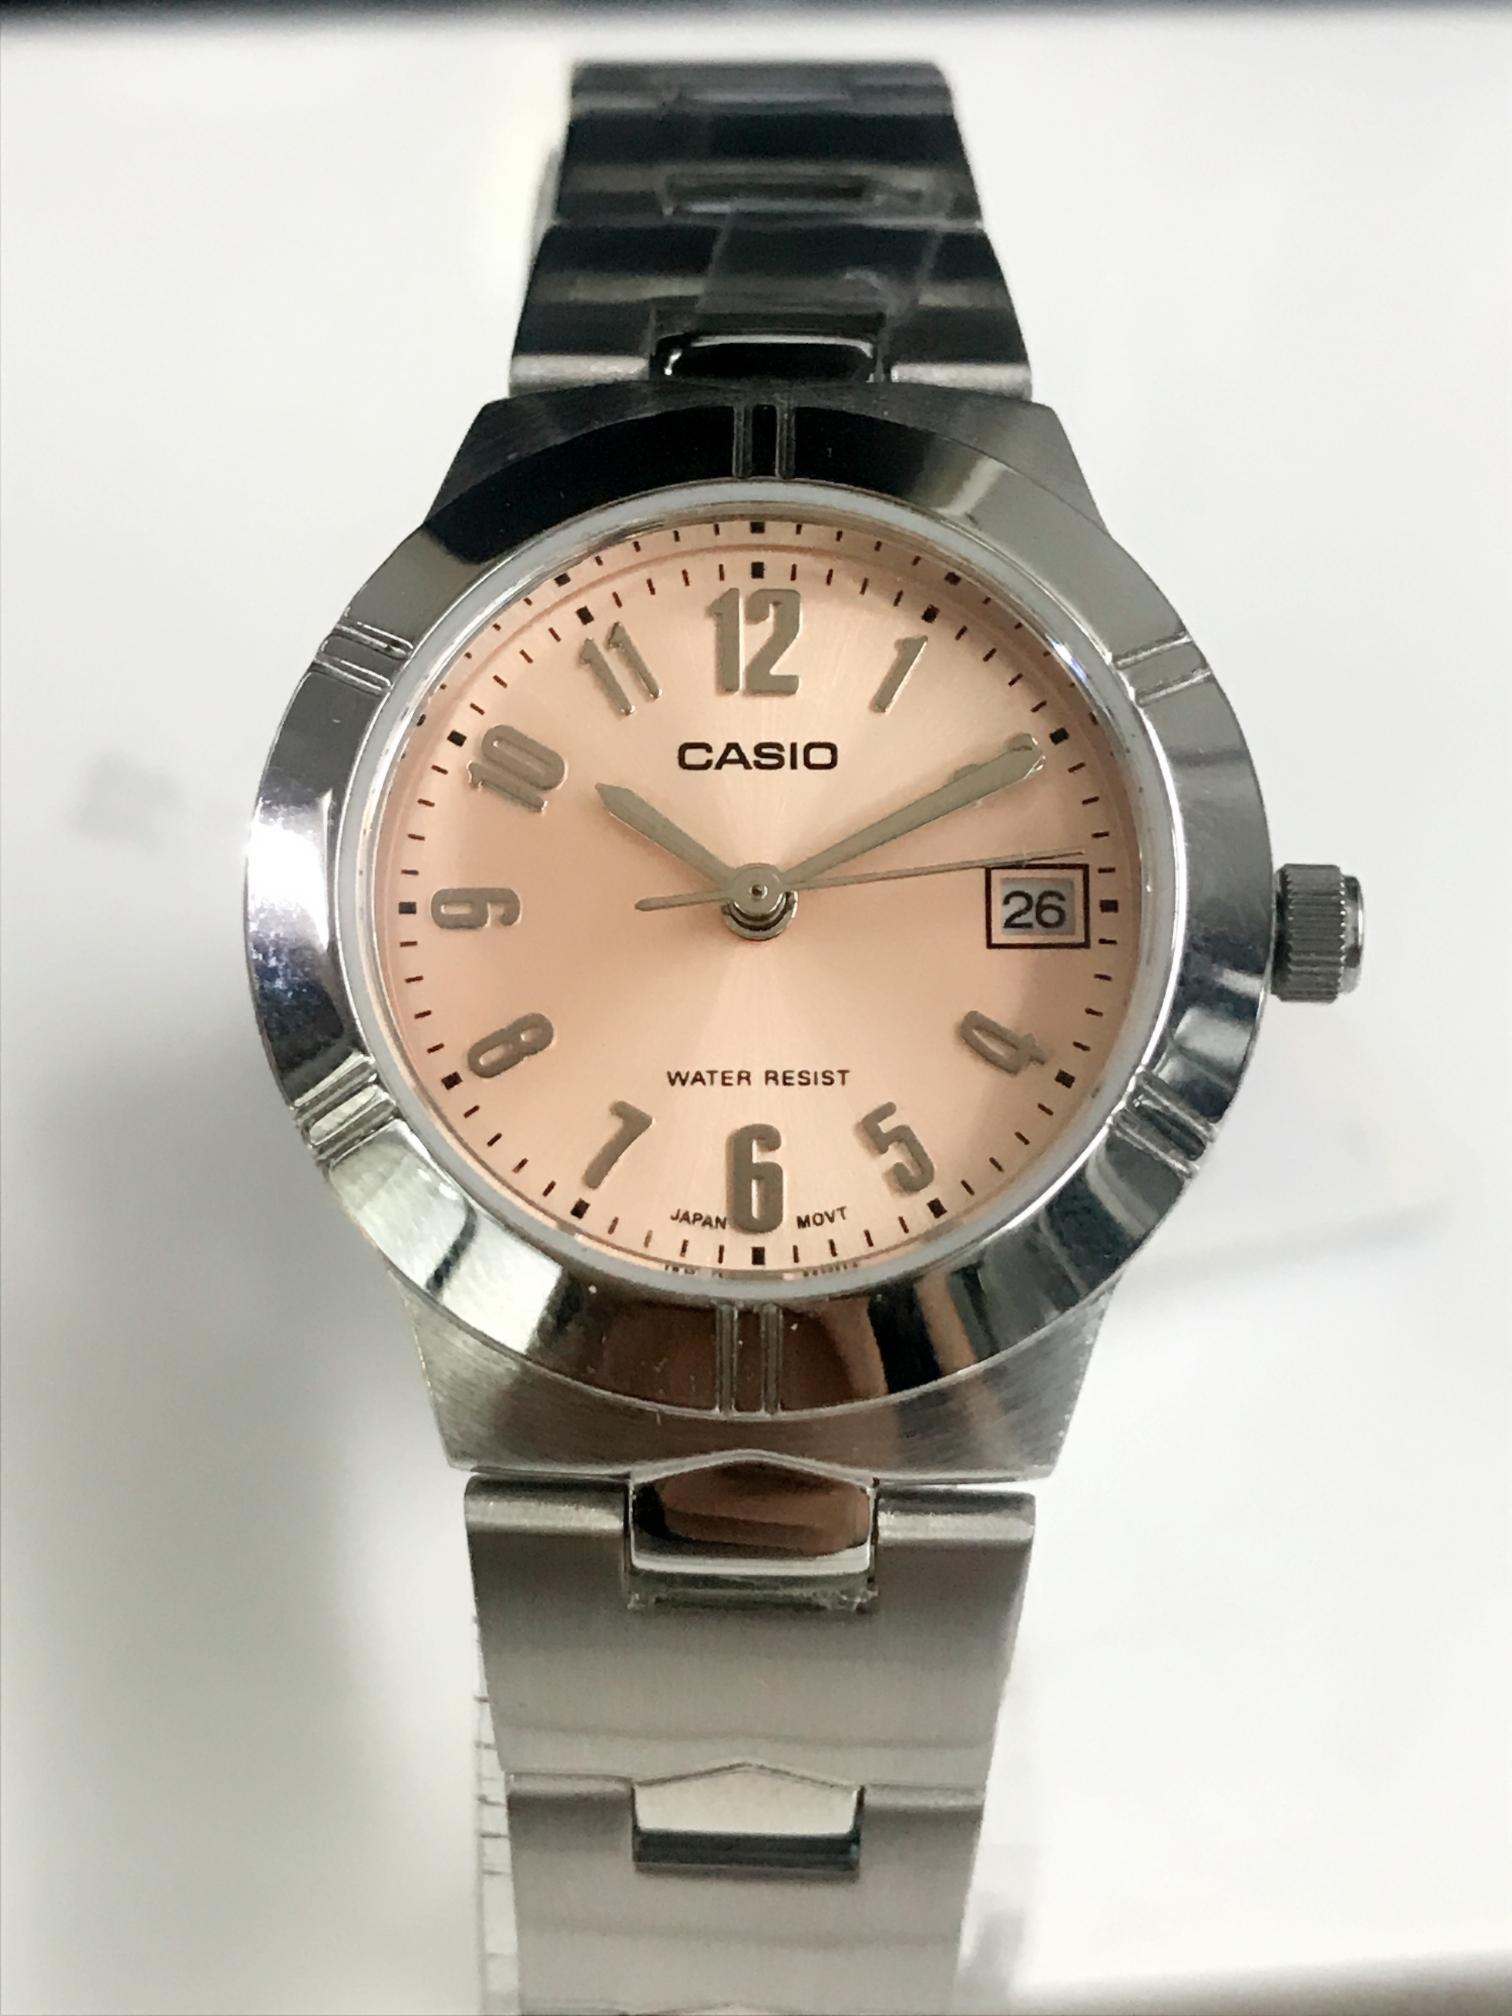 ĐỒNG HỒ CASIO NỮ LTP-1241D-4A3DF